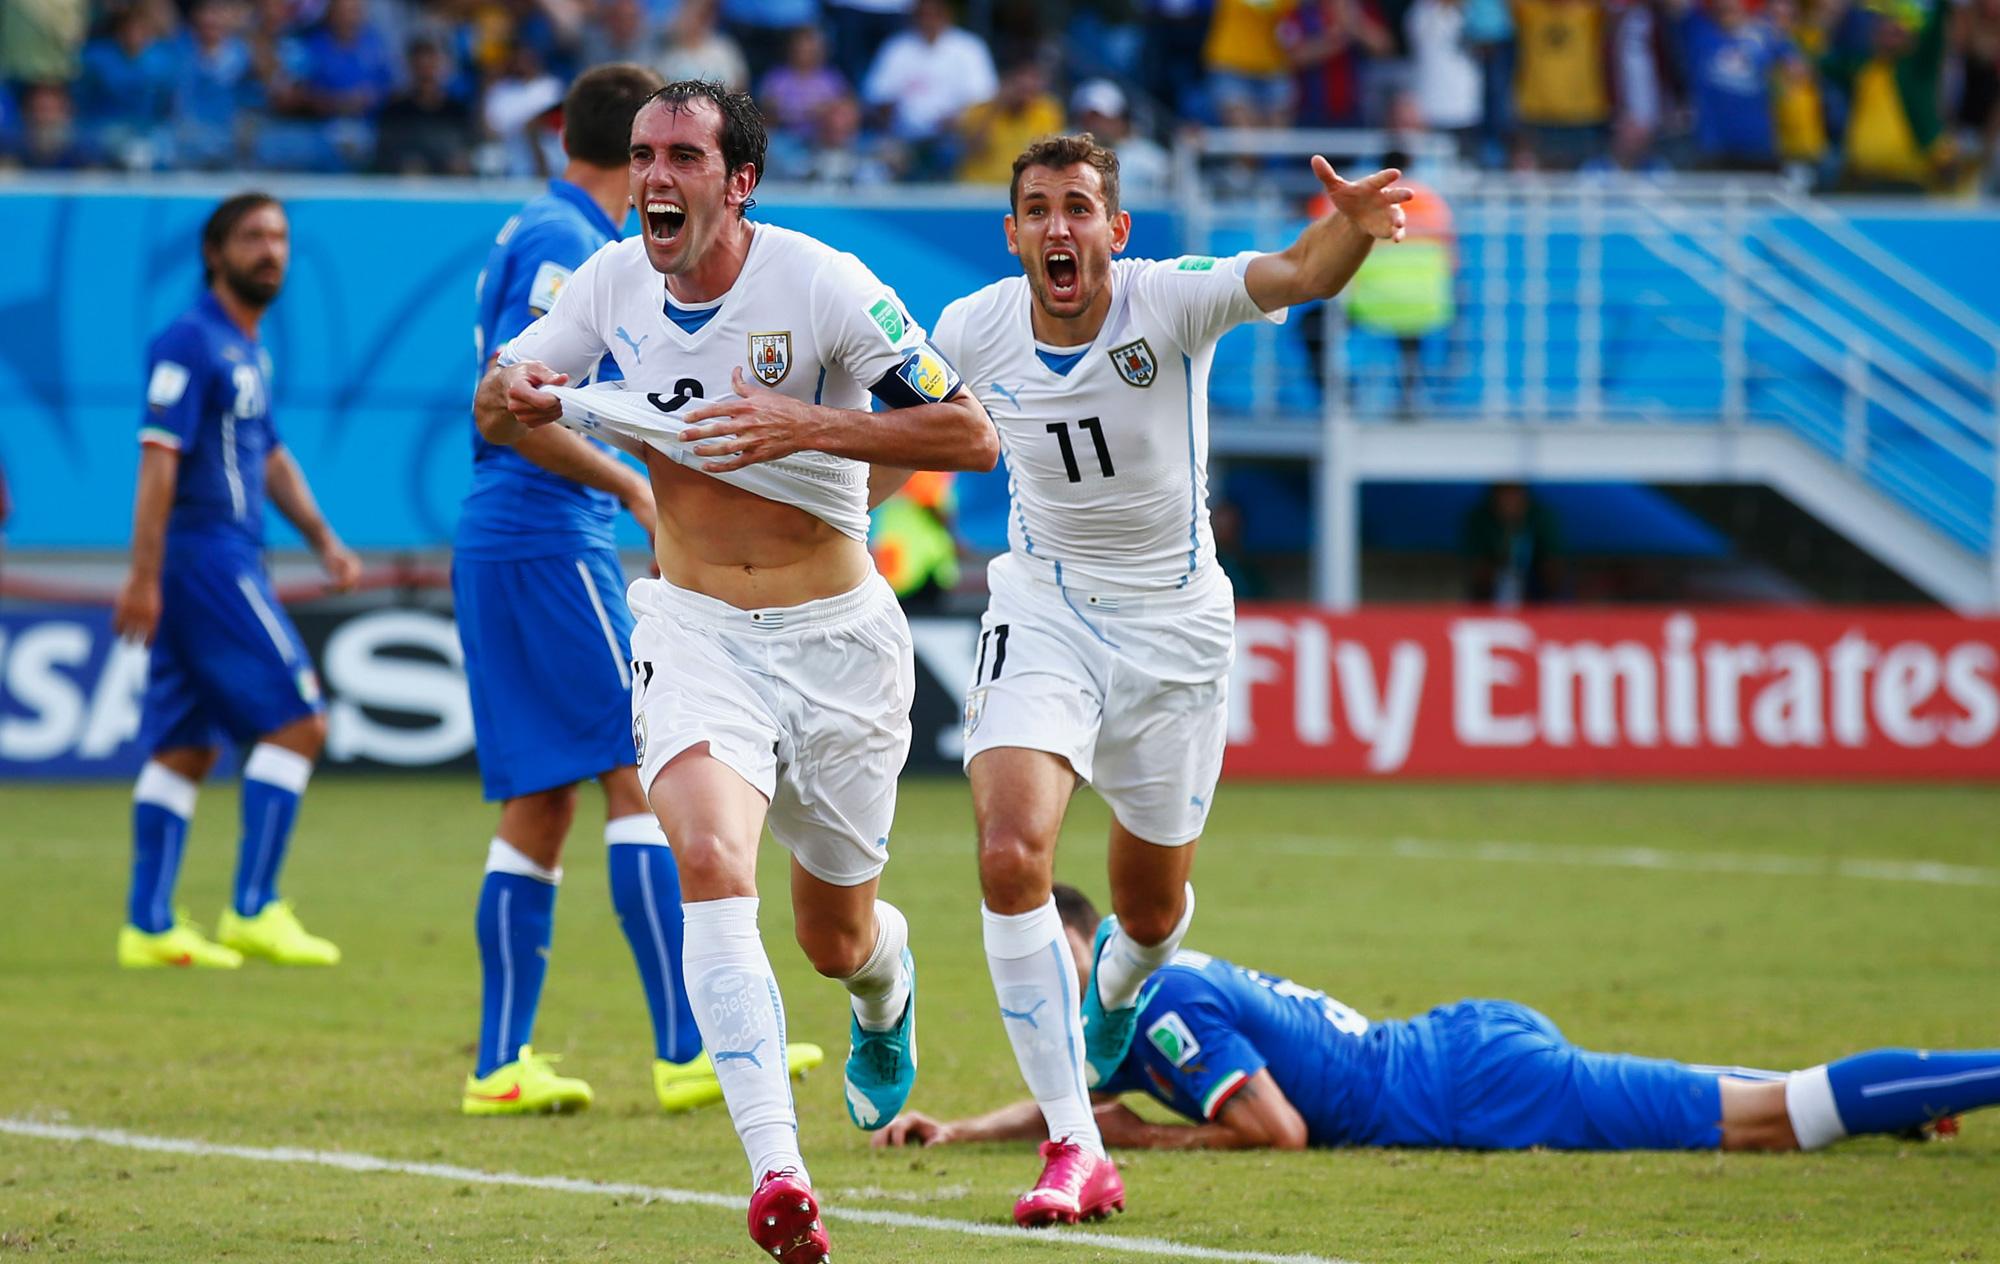 Fantasma vive  Uruguai abocanha a vaga e elimina a Itália do Mundial ... 2d26968f72e3f